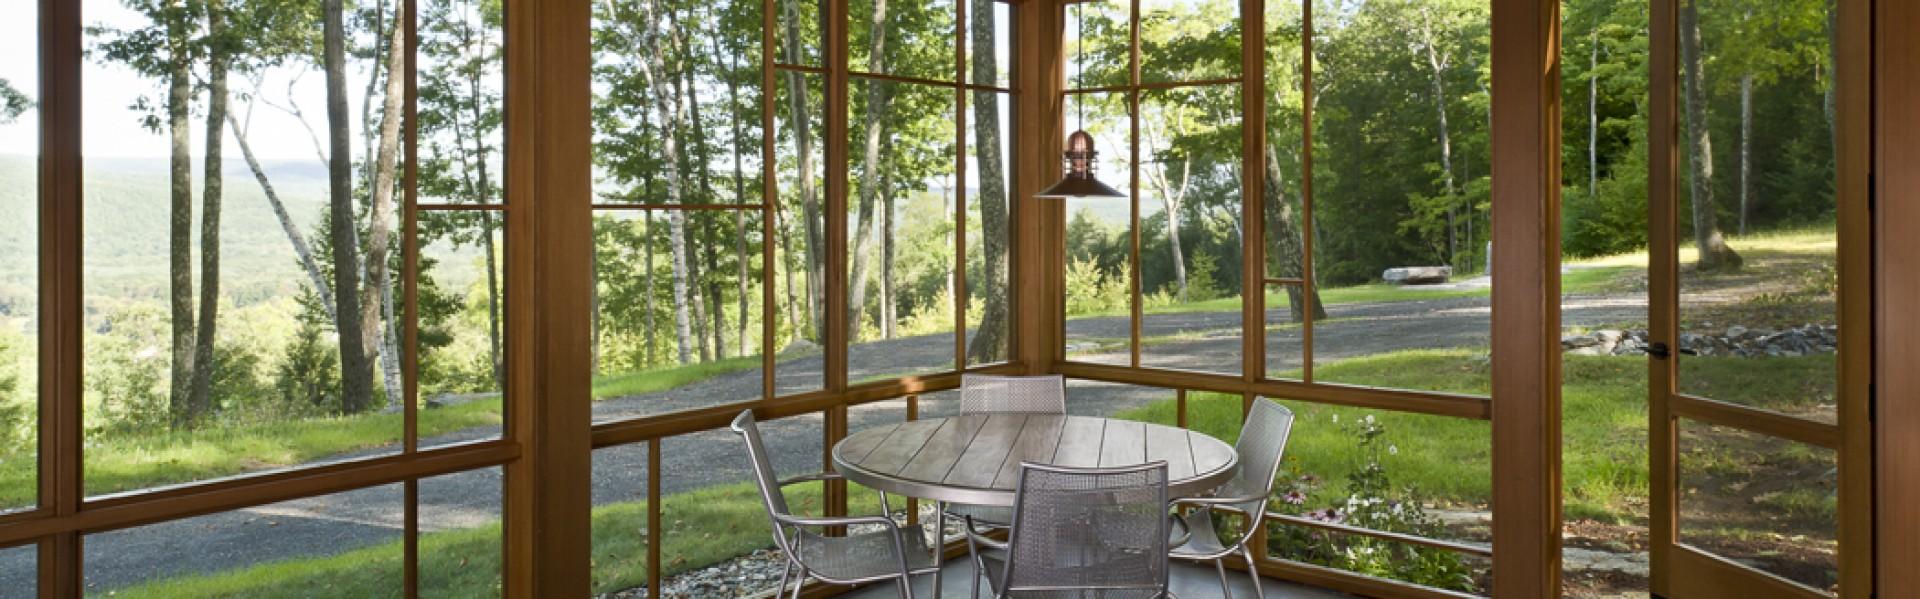 Okerstrom Lang Landscape Architects